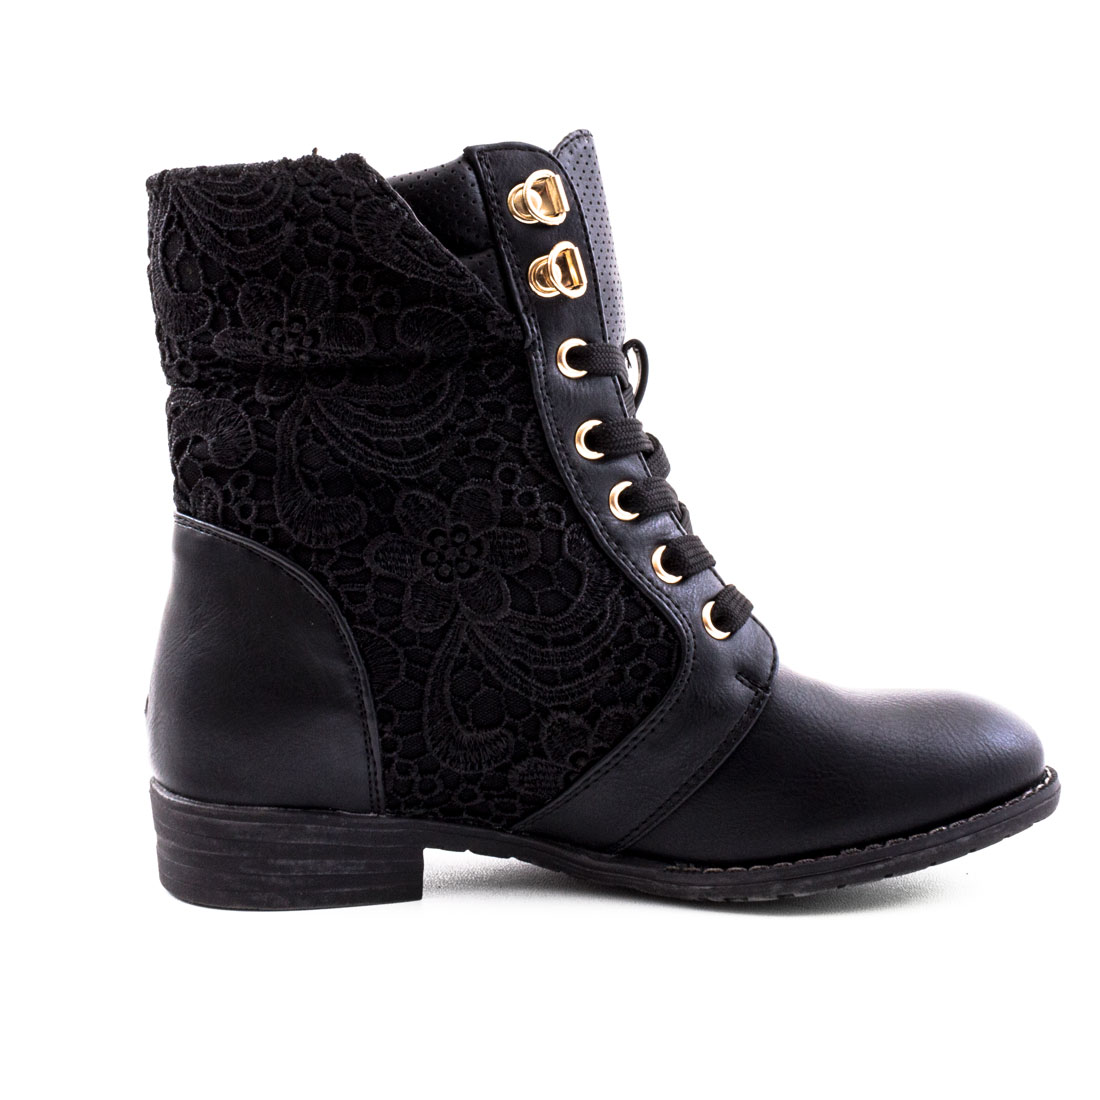 neu damen biker boots spitze schn r stiefel nieten schuhe gr 36 37 38 39 40 41 ebay. Black Bedroom Furniture Sets. Home Design Ideas